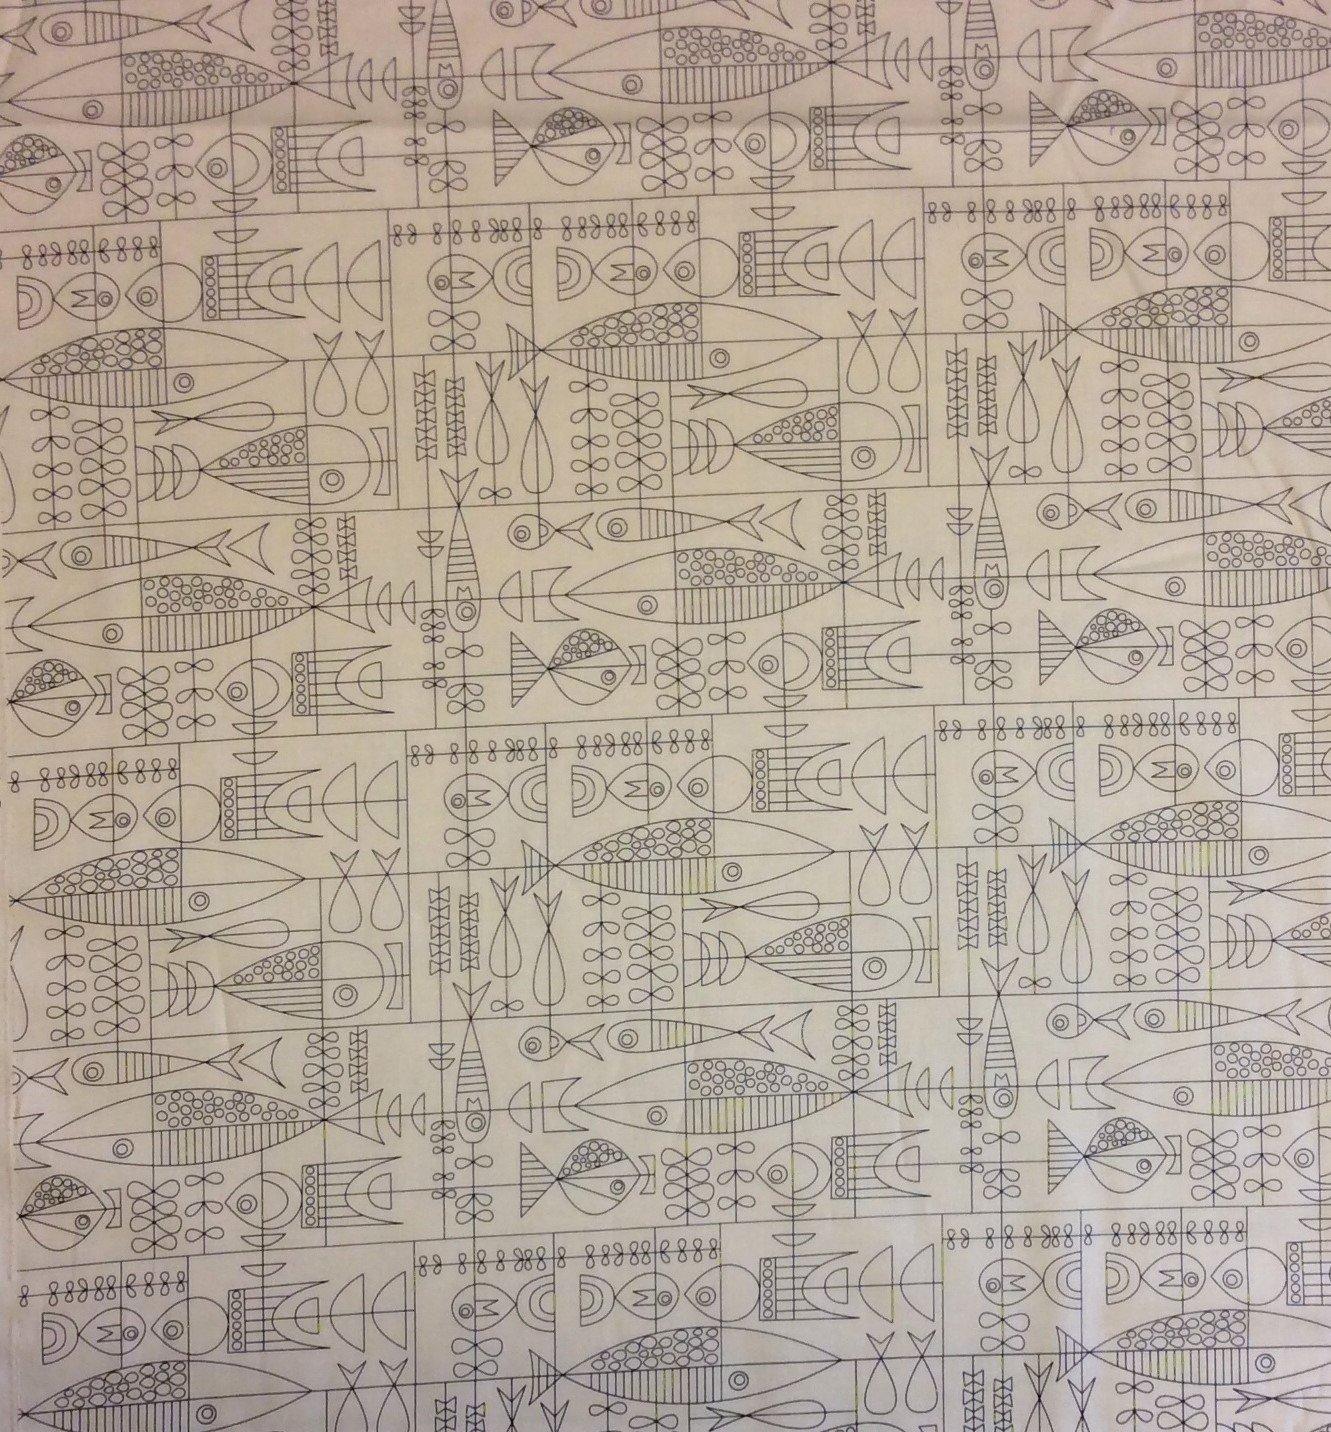 Atomic Mid Century Modern Moda Mobile Retro Boomerang Art 50s Style Cotton Quilting Fabric  MO31